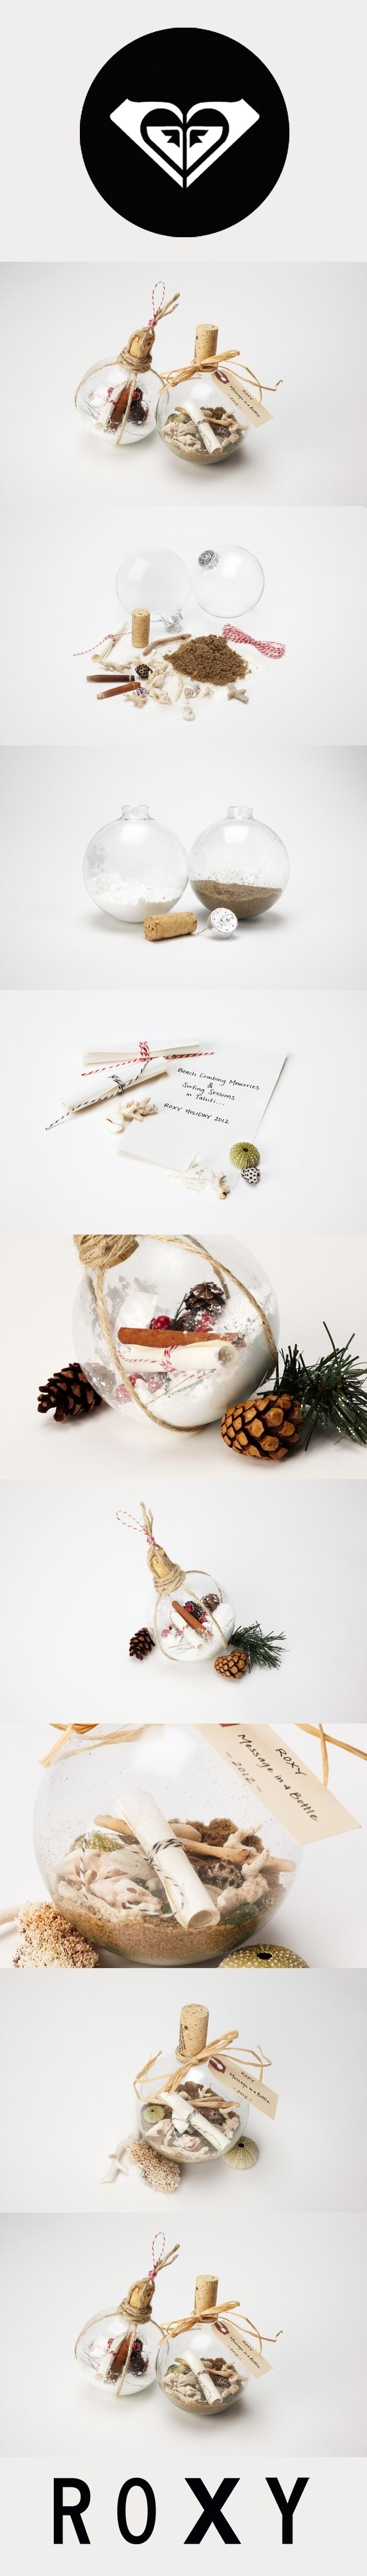 #DIY Roxy Ornaments! PIN ME!